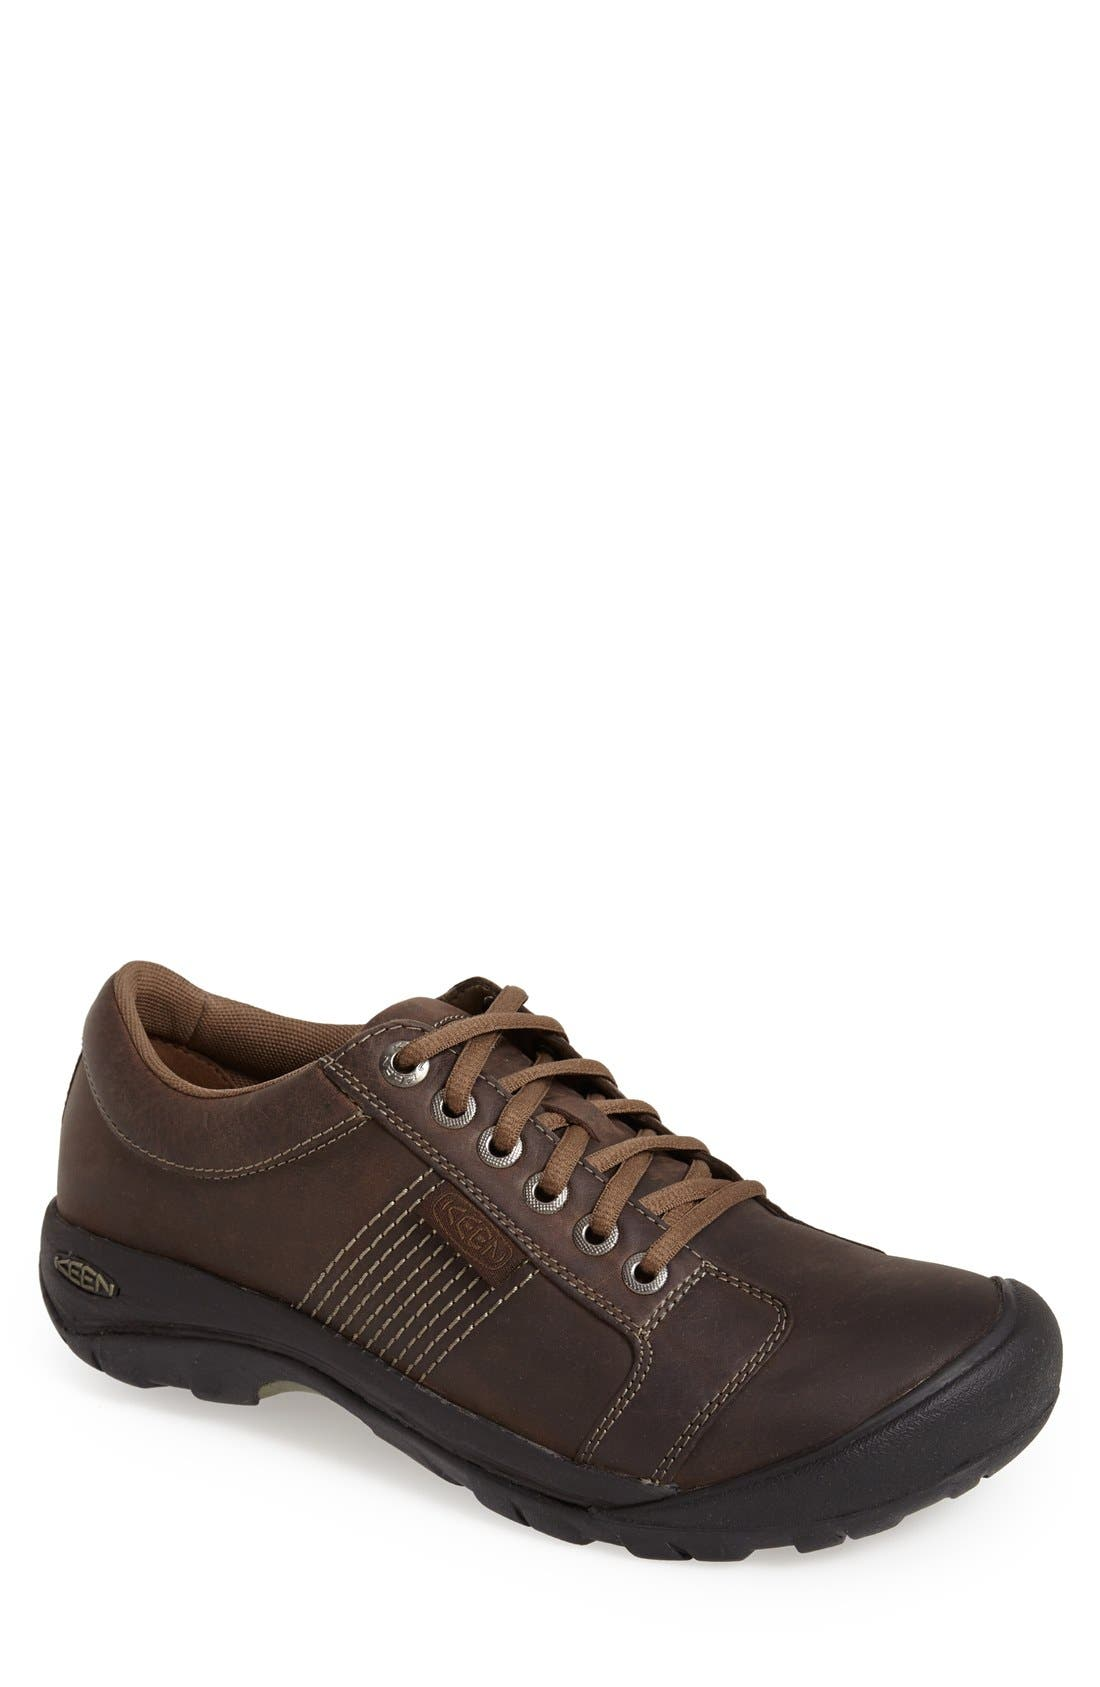 'Austin' Sneaker, Main, color, CHOCOLATE BROWN